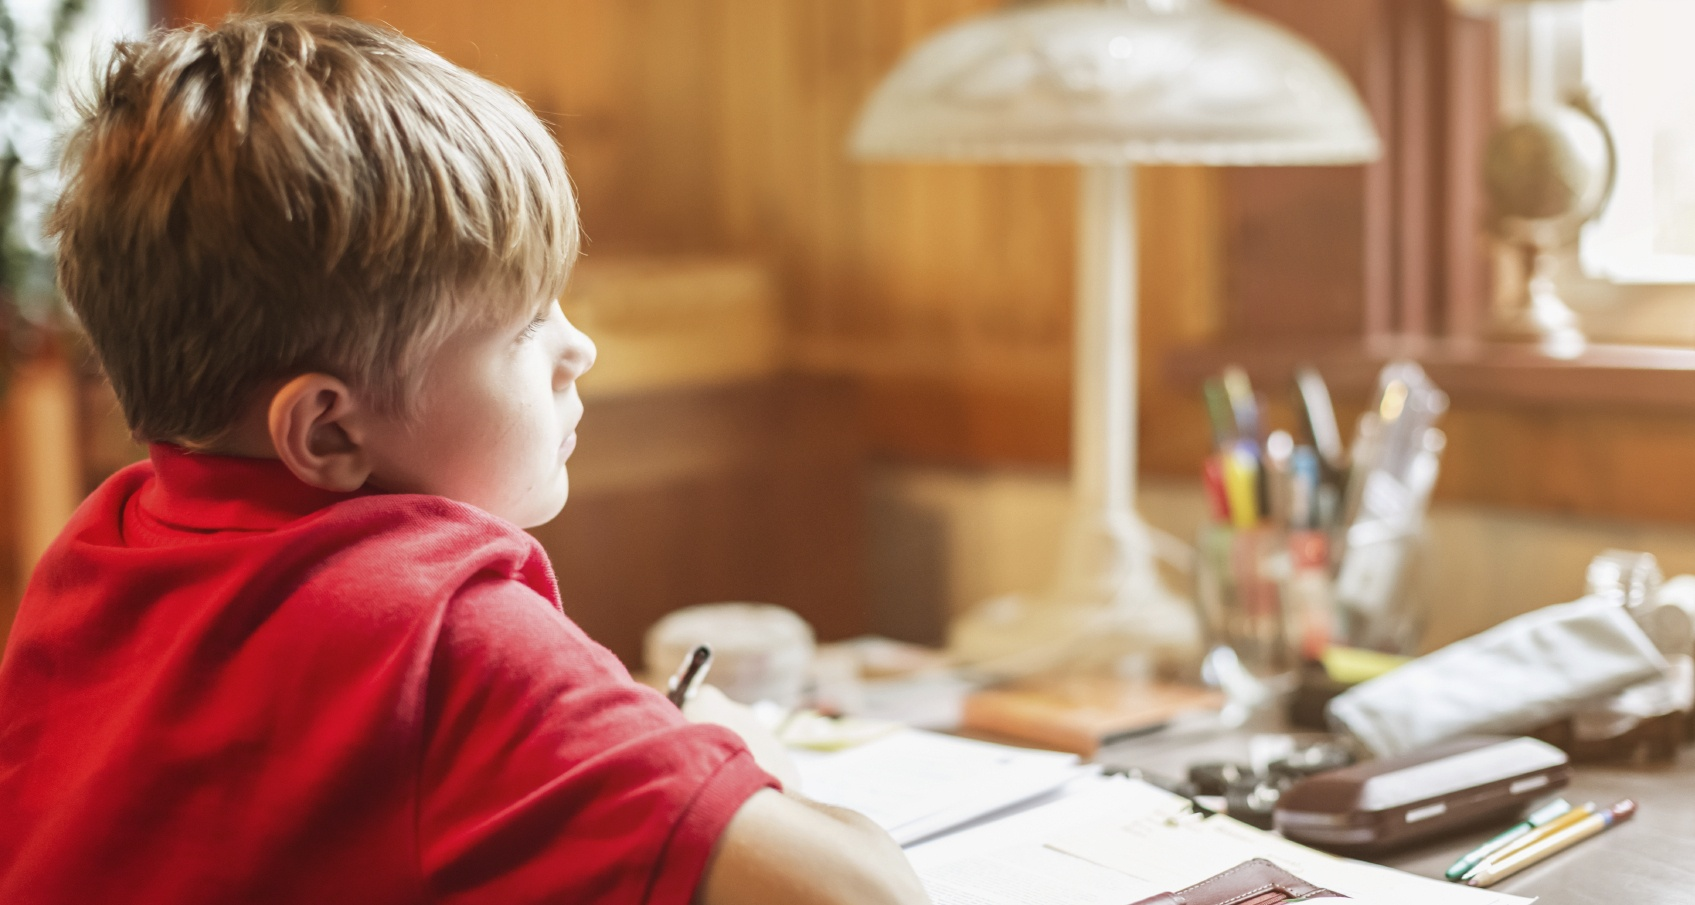 Boy doing homework looking outside